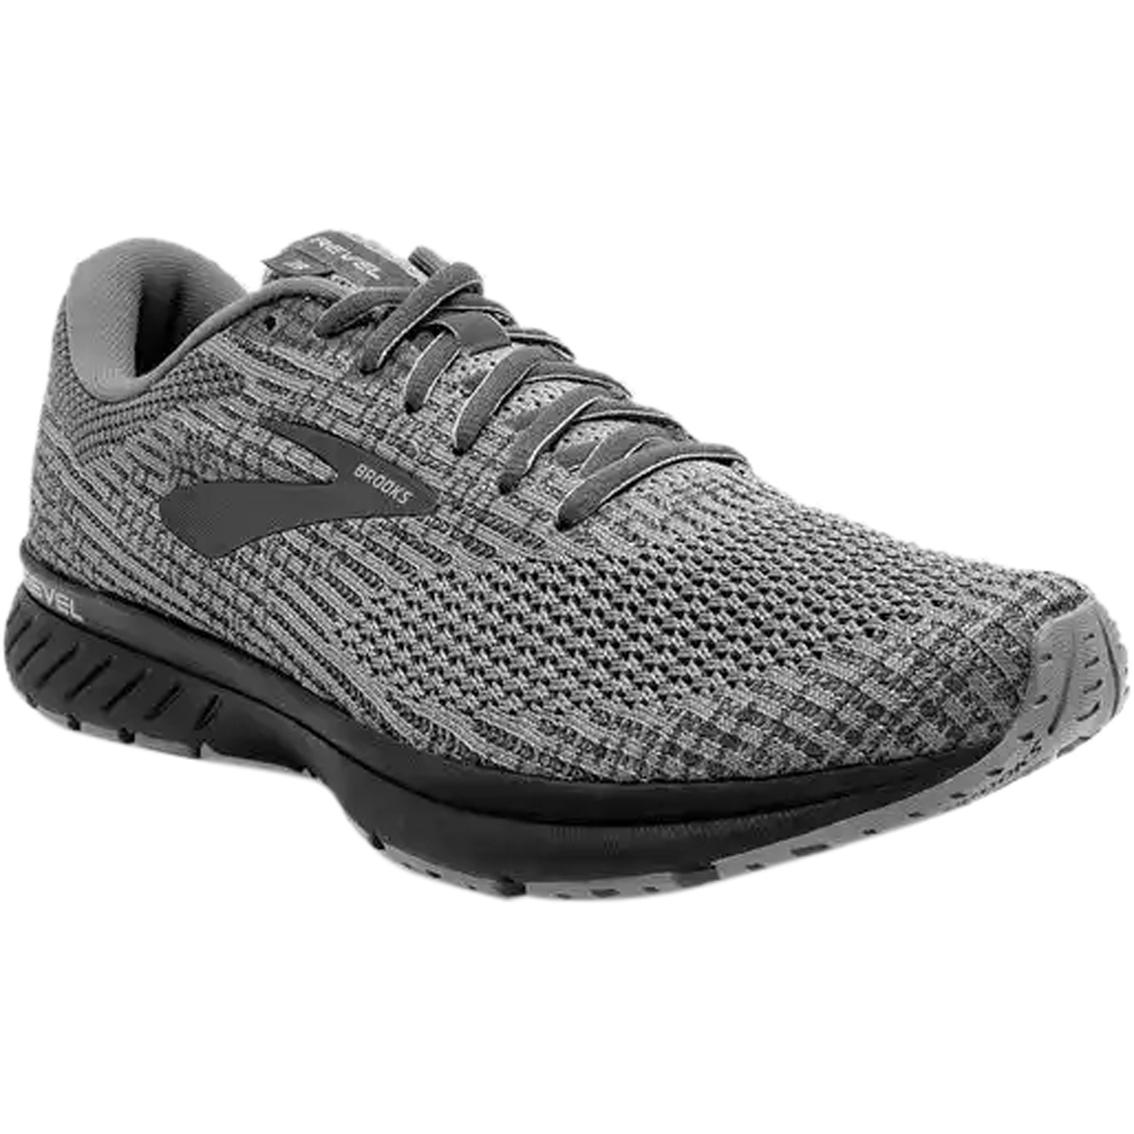 all black brooks men's shoes